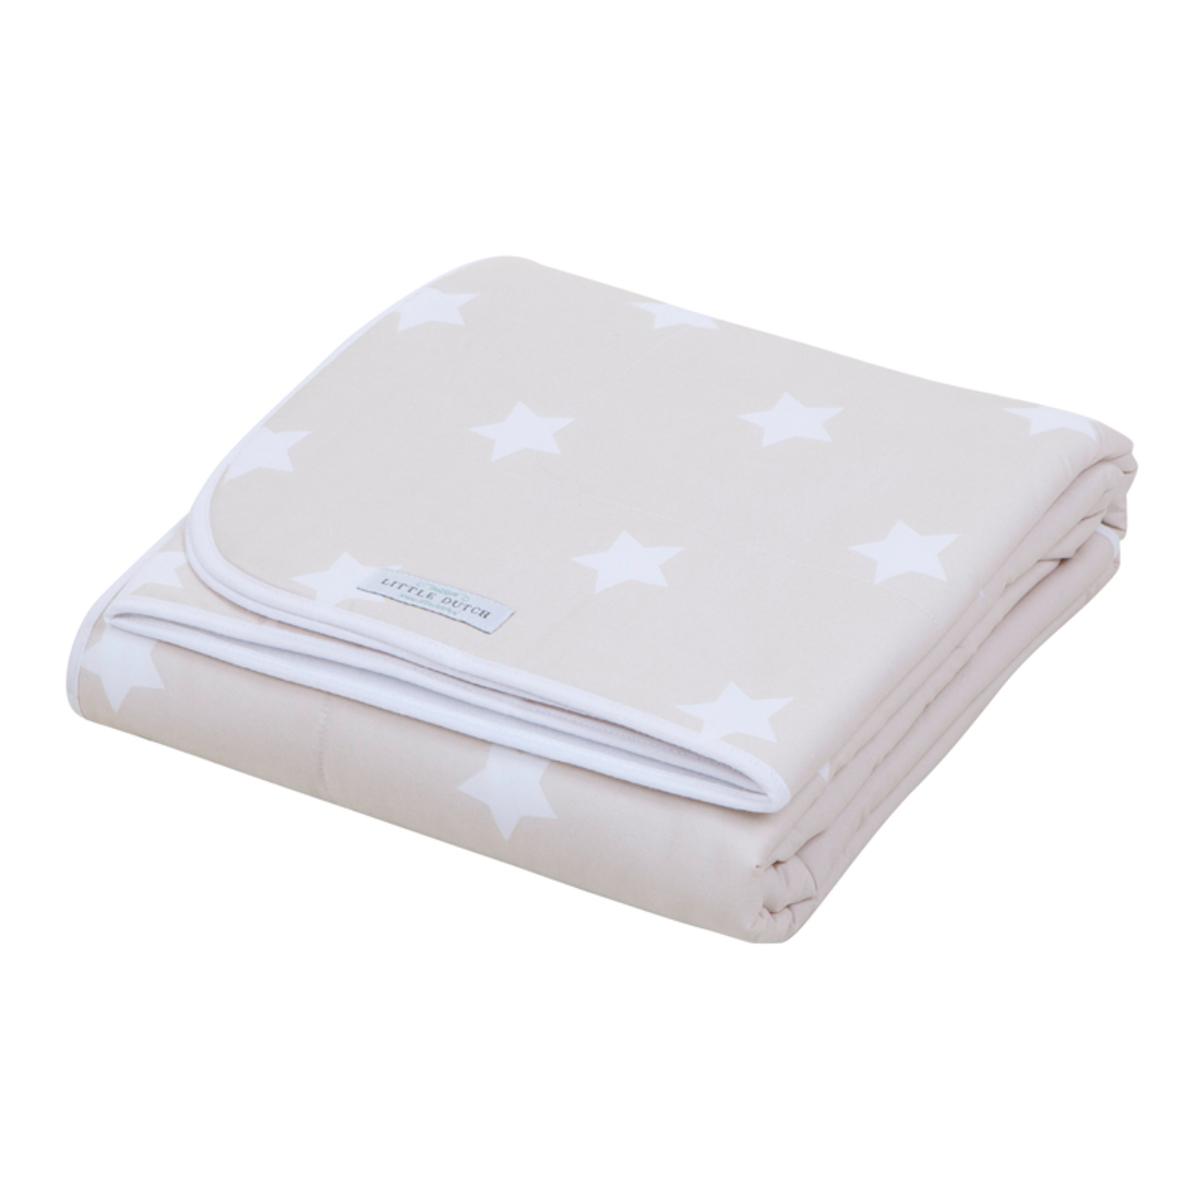 couverture de lit beige with white star 0286 ld achat. Black Bedroom Furniture Sets. Home Design Ideas